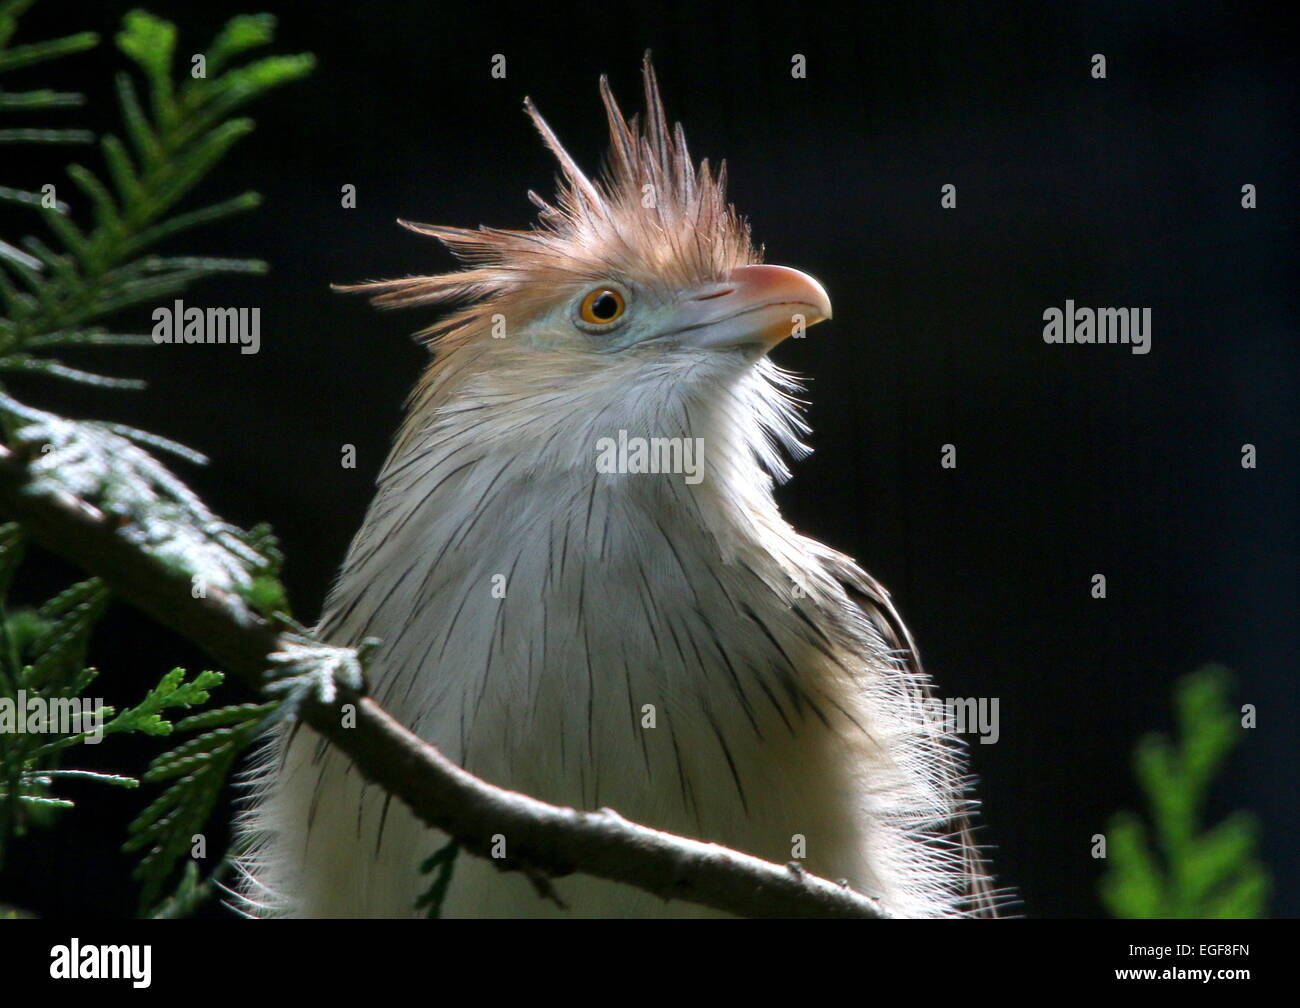 South American Guira cuckoo (Guira guira), close-up of the head - Stock Image